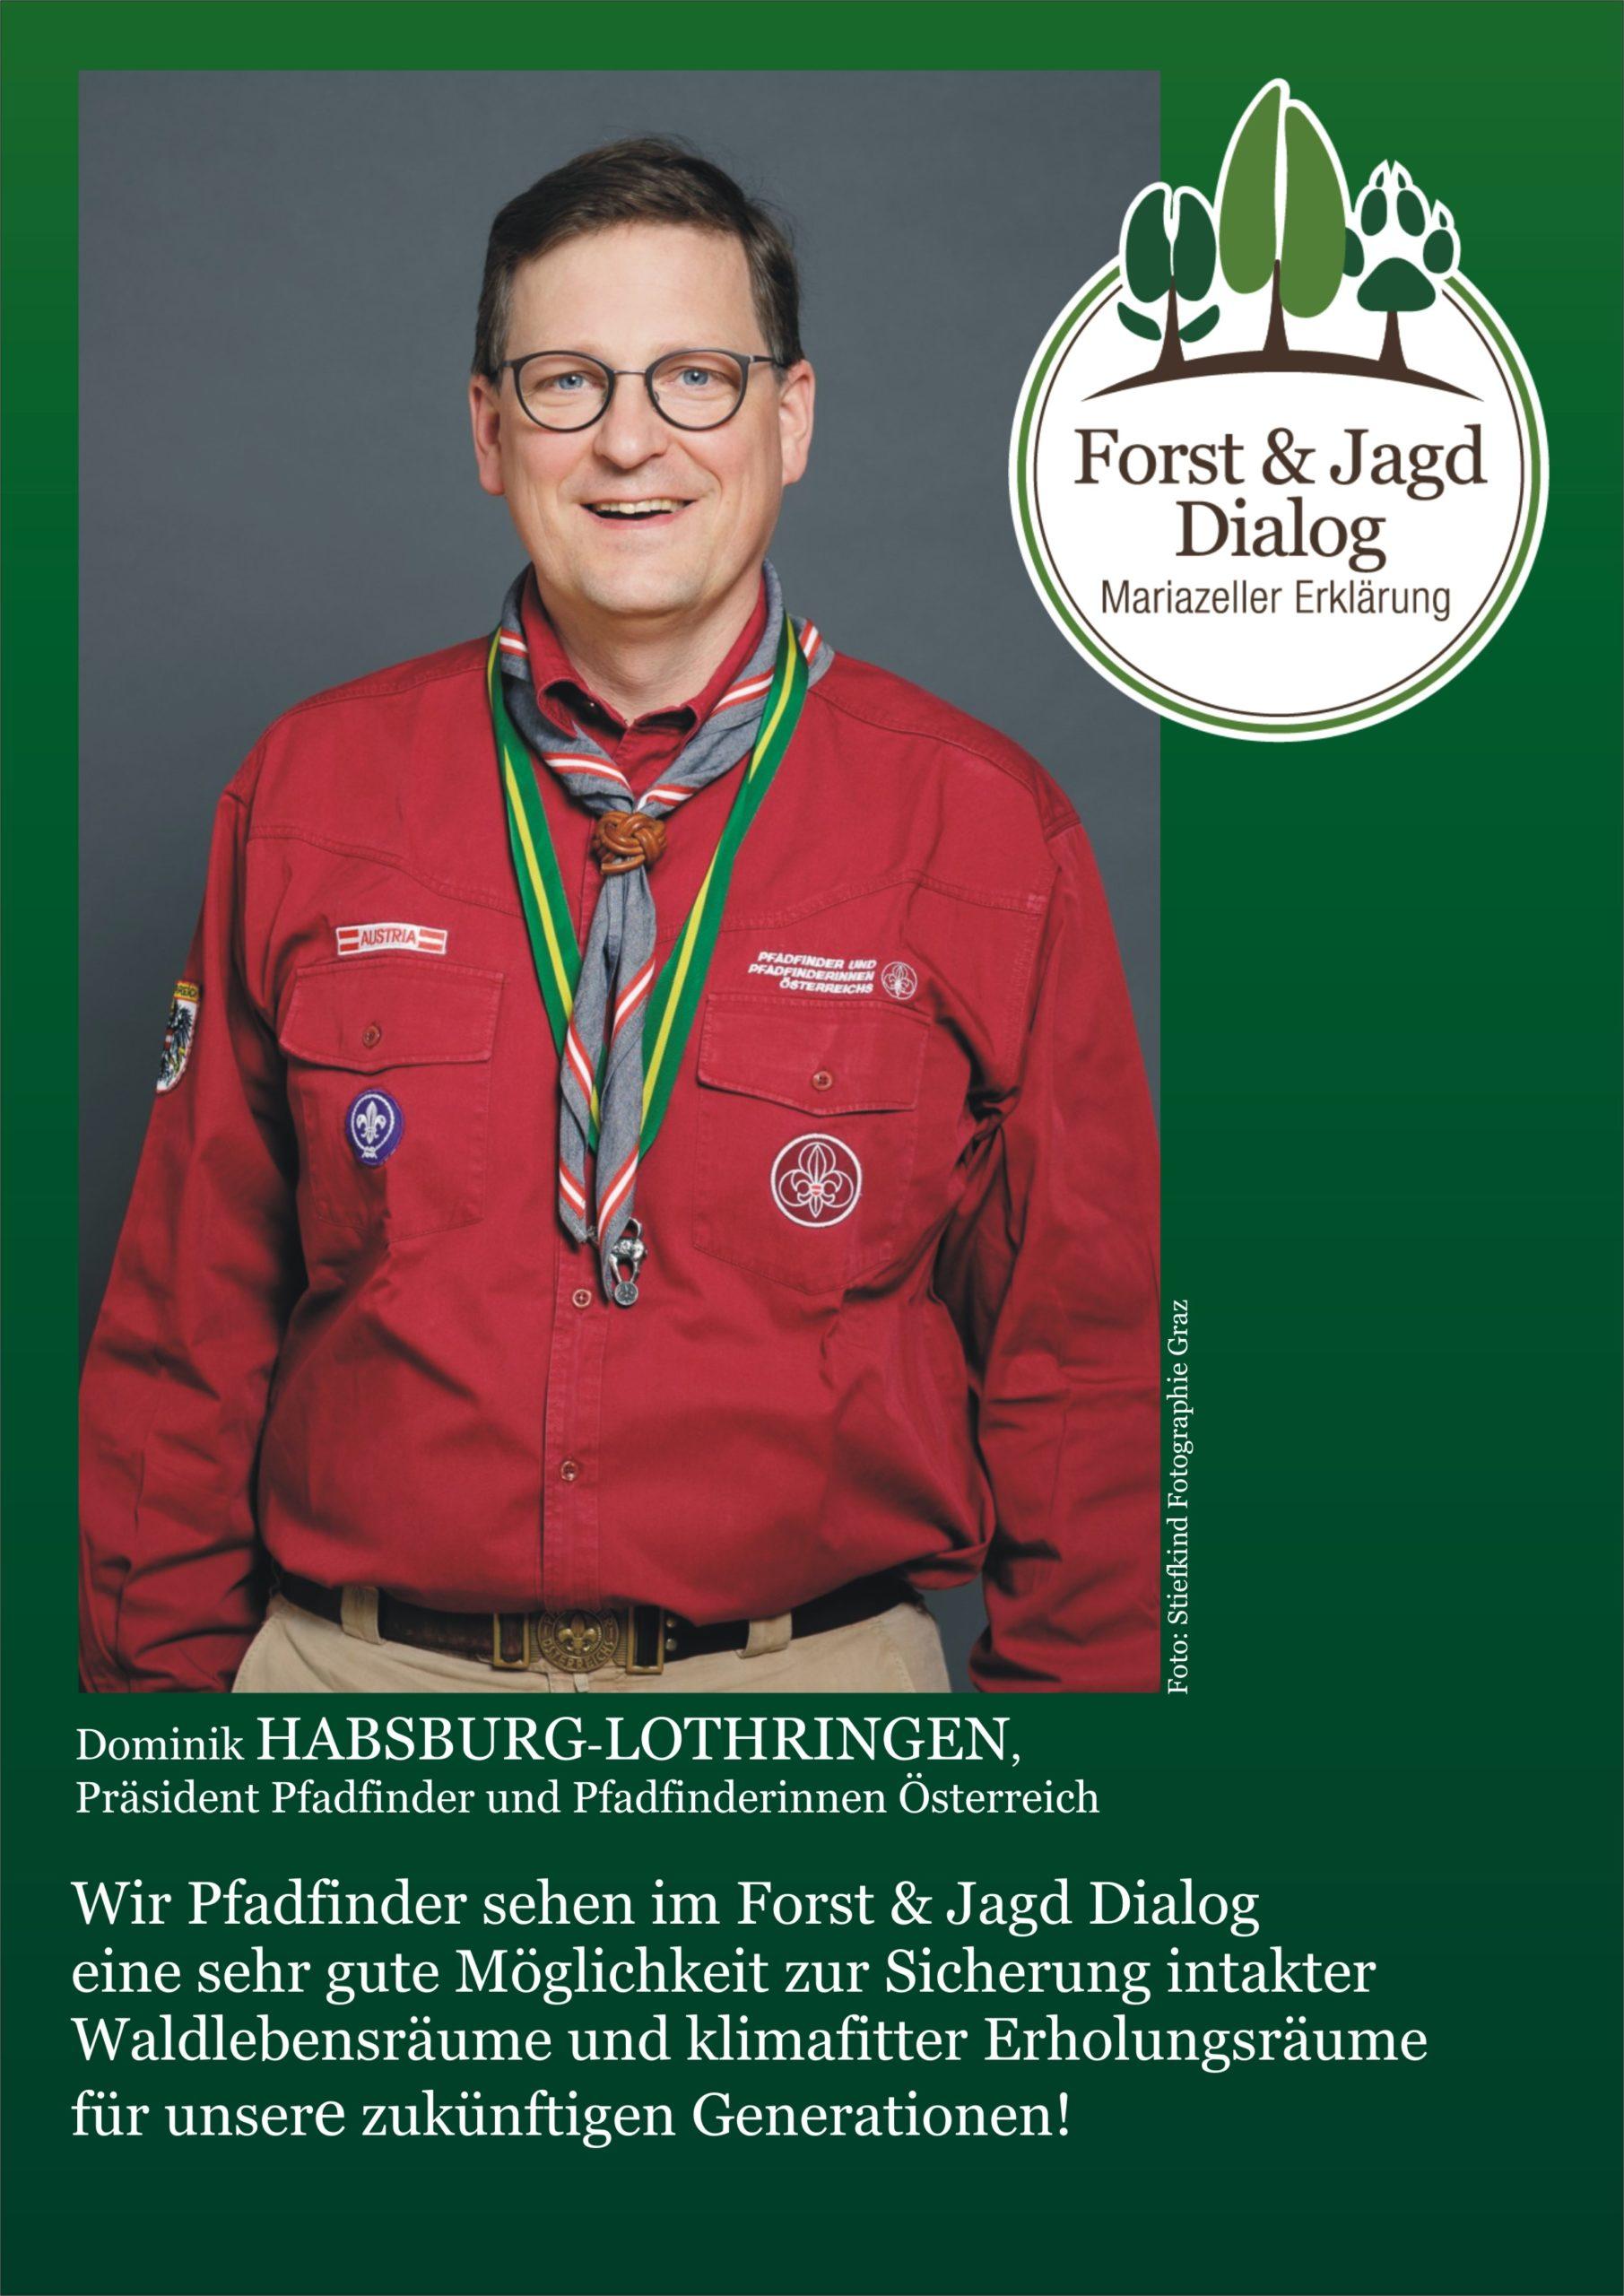 Partner & Prominente Stimmen, Forst & Jagd Dialog Österreich